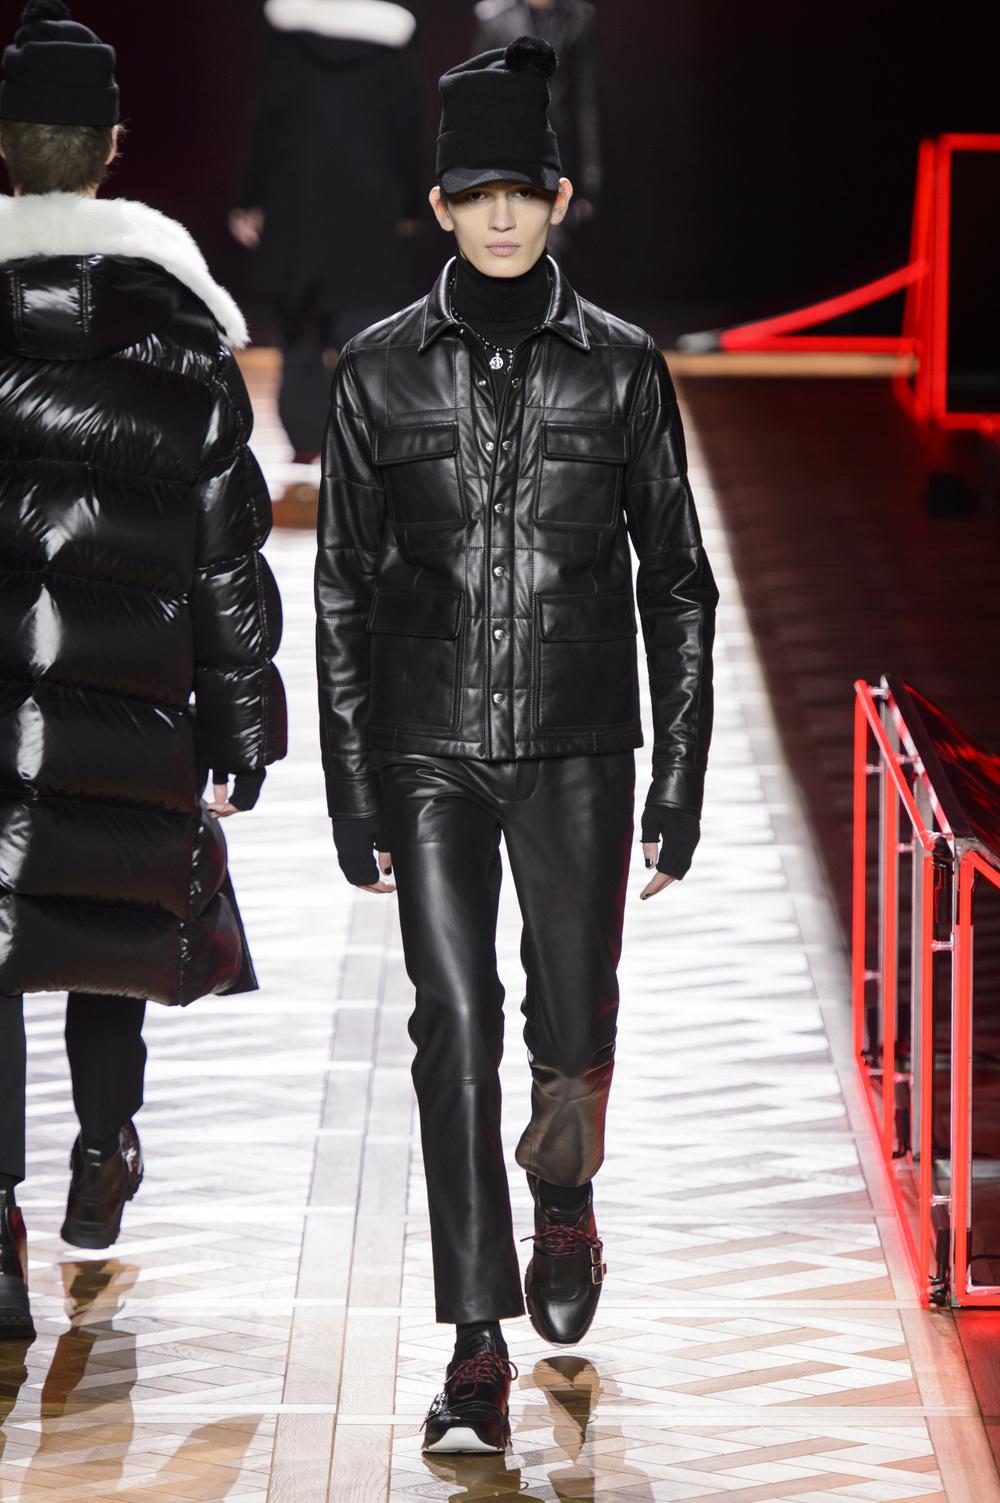 Dior_Homme_Hiver2016-17_look_15.JPG